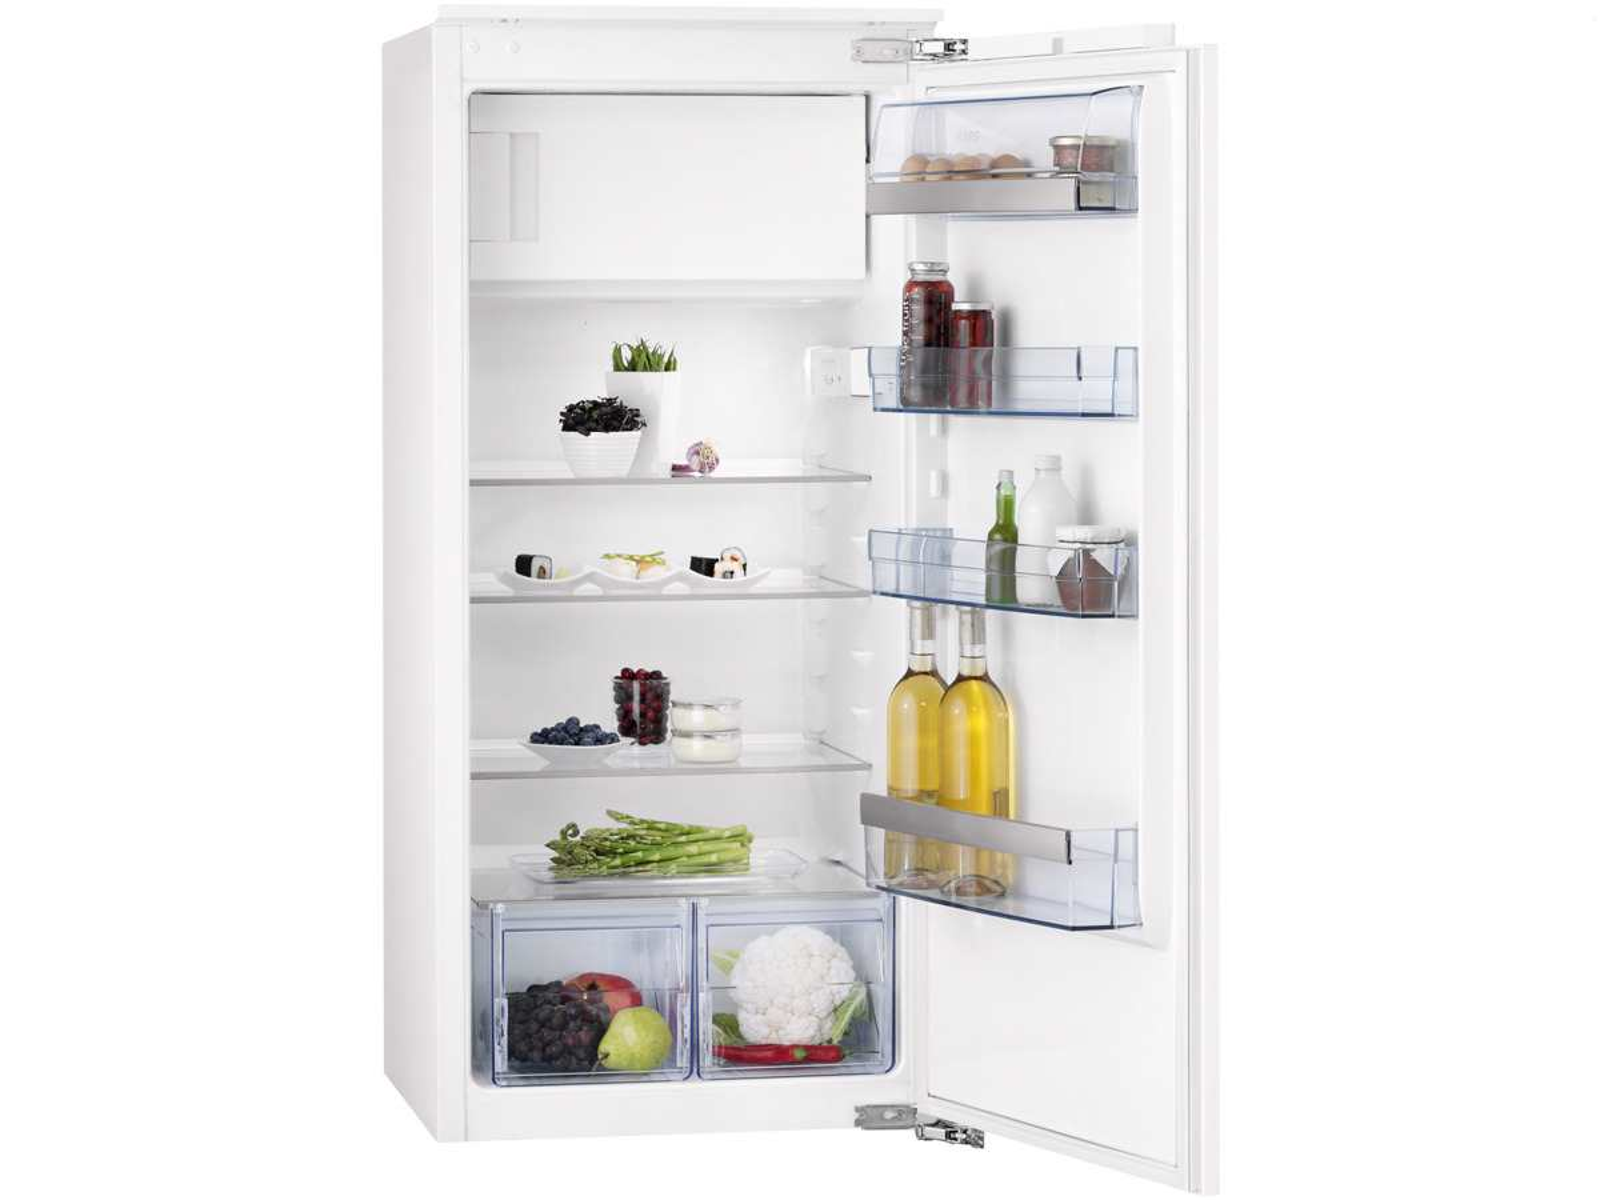 Gorenje Kühlschrank B Ware : Gorenje retro kühlschrank b ware neu b ware verschiedene